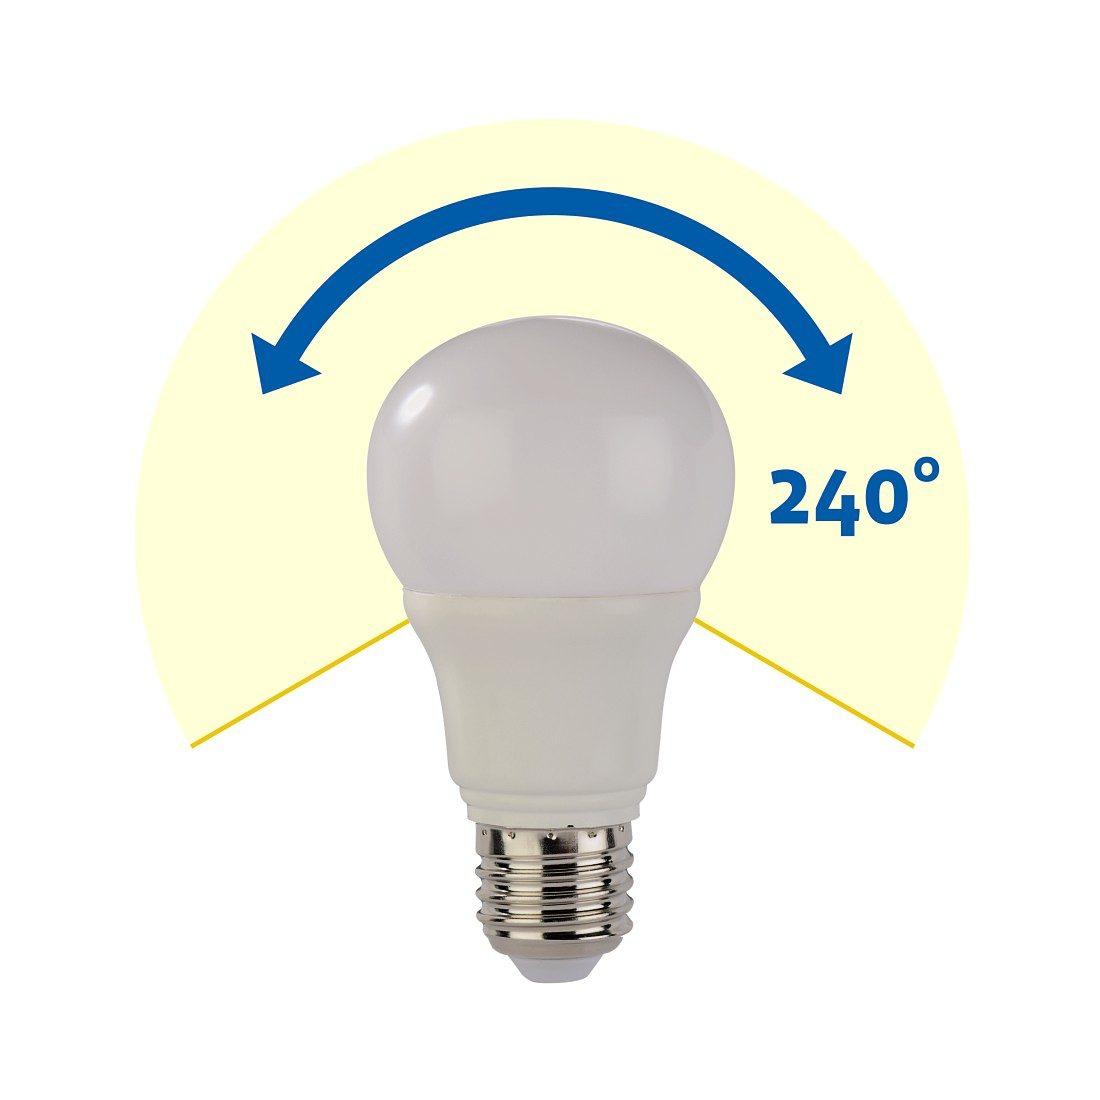 Xavax LED-Lampe, 5,5W, Glühlampenform, E27, Warmweiß